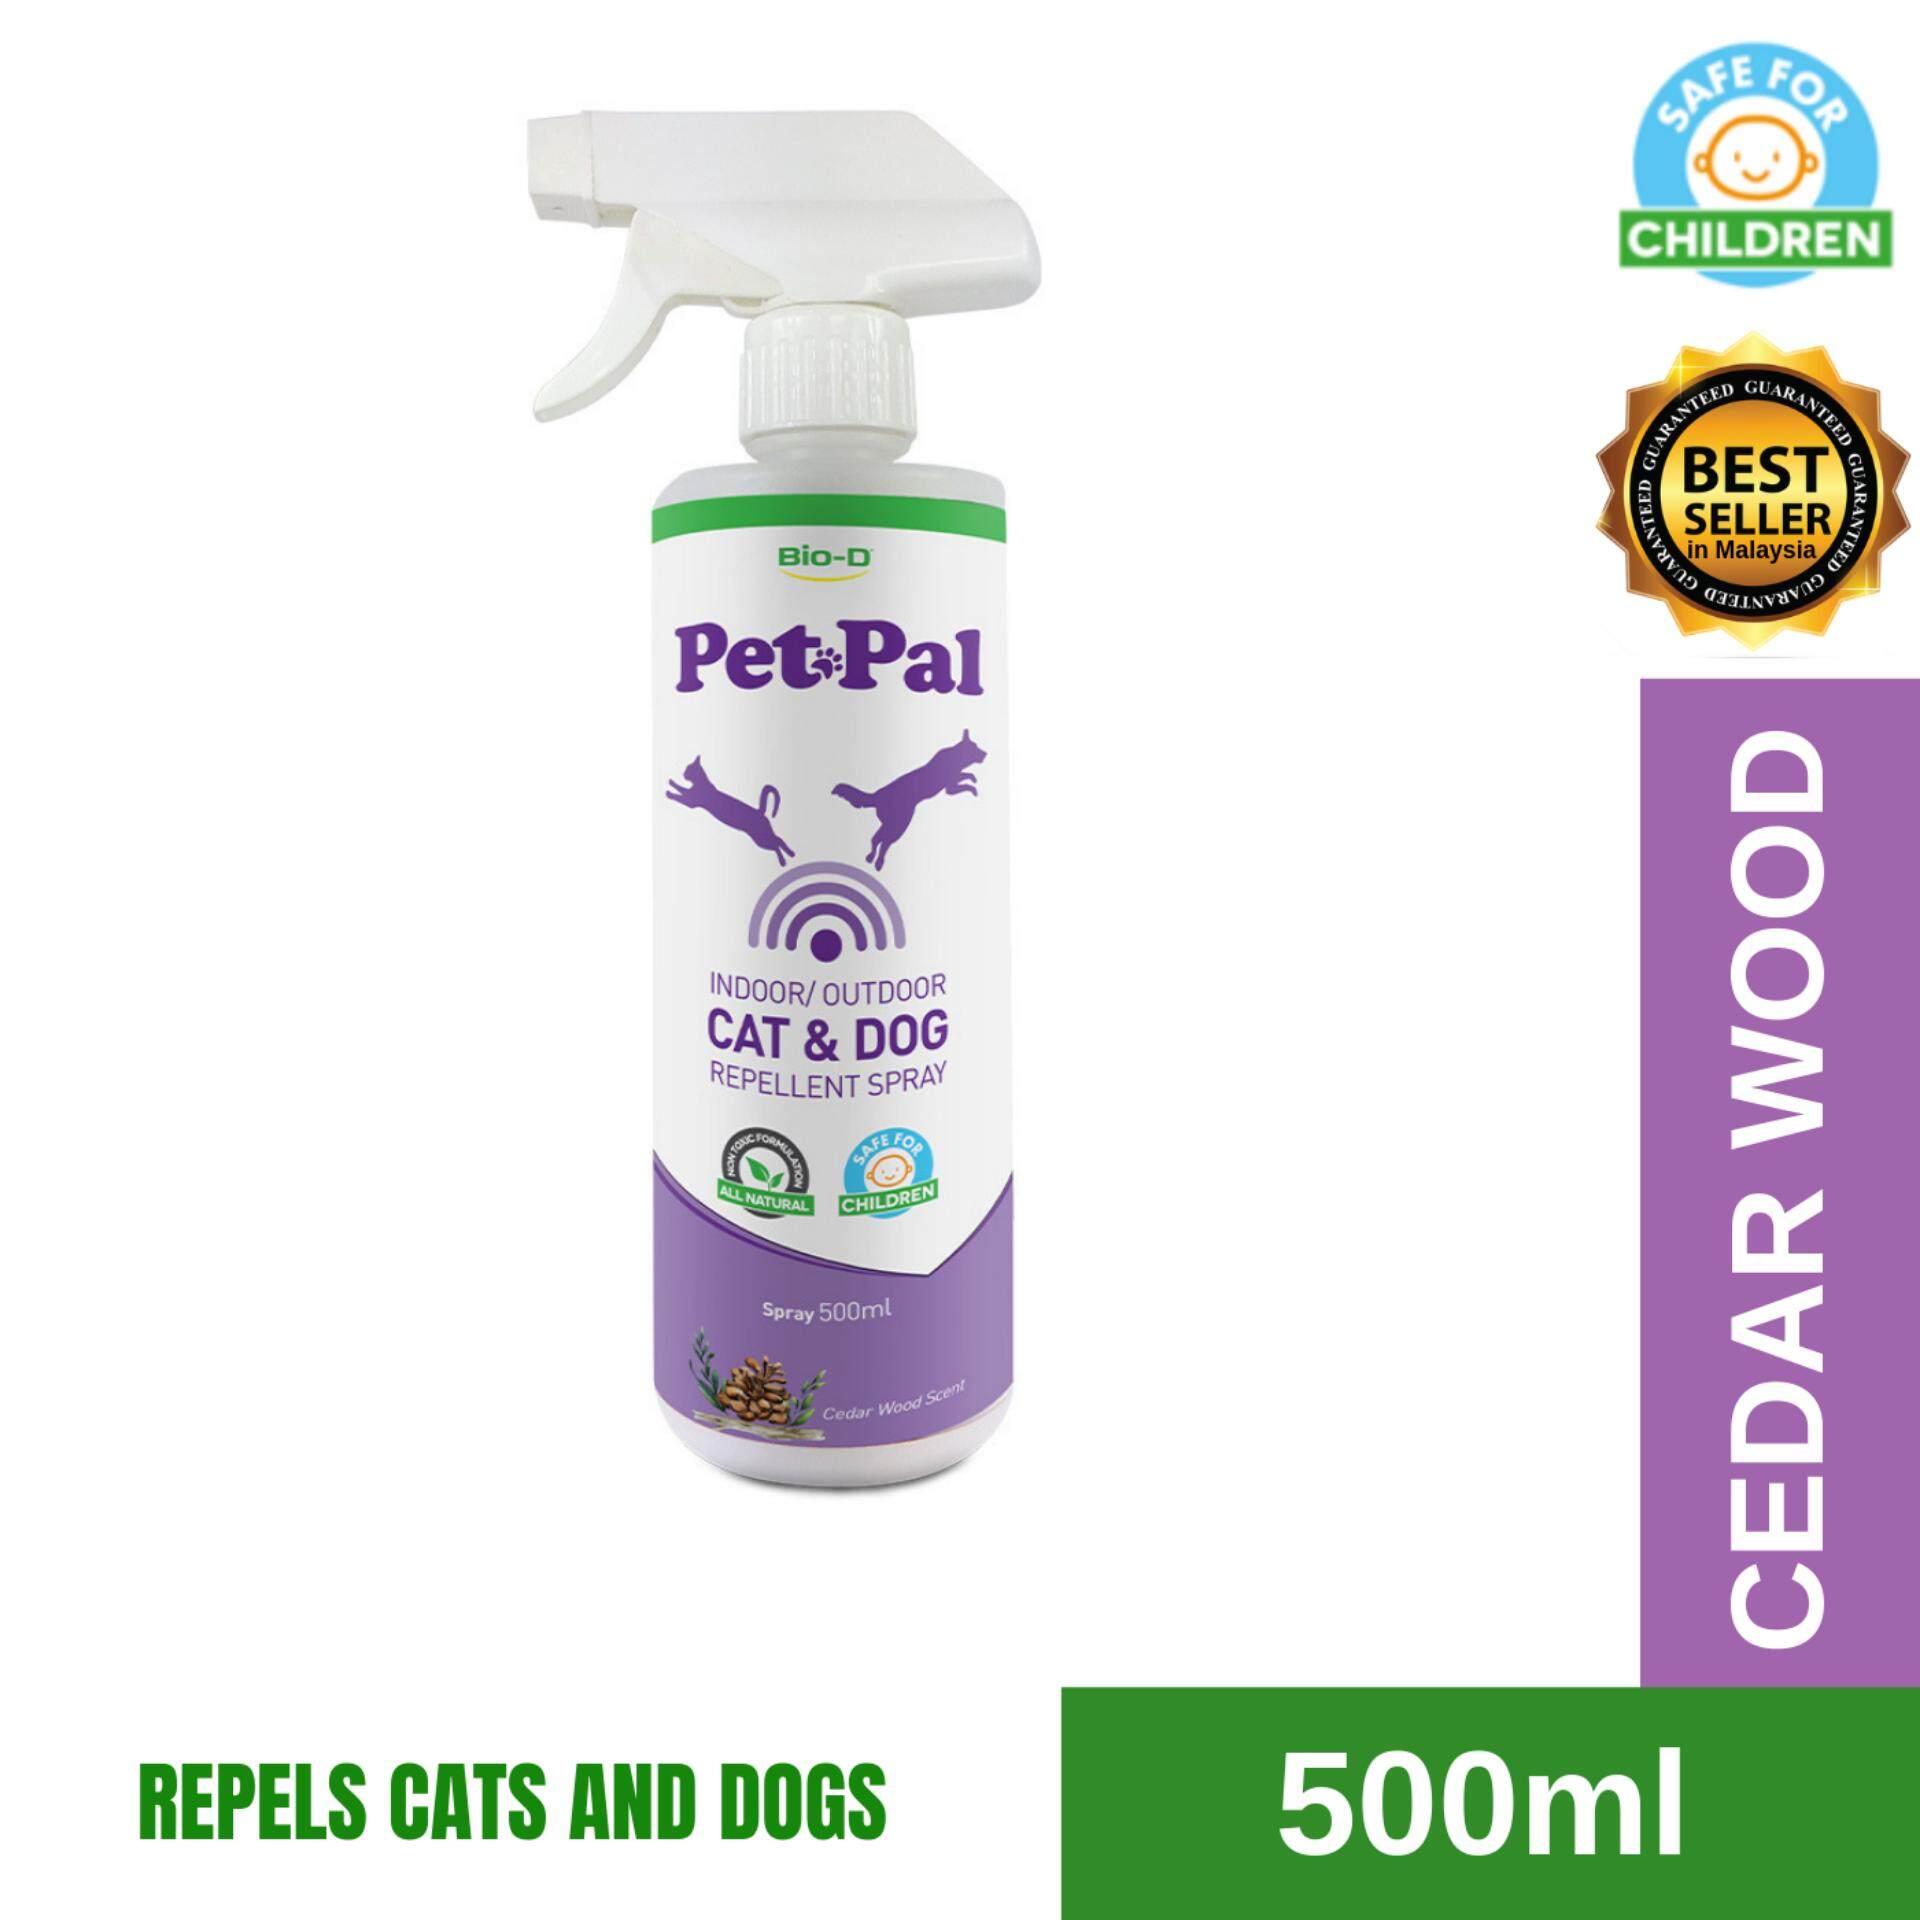 Bio-D Cat & Dog Repellent Spray 500ml (Cedar Wood Fragrance)